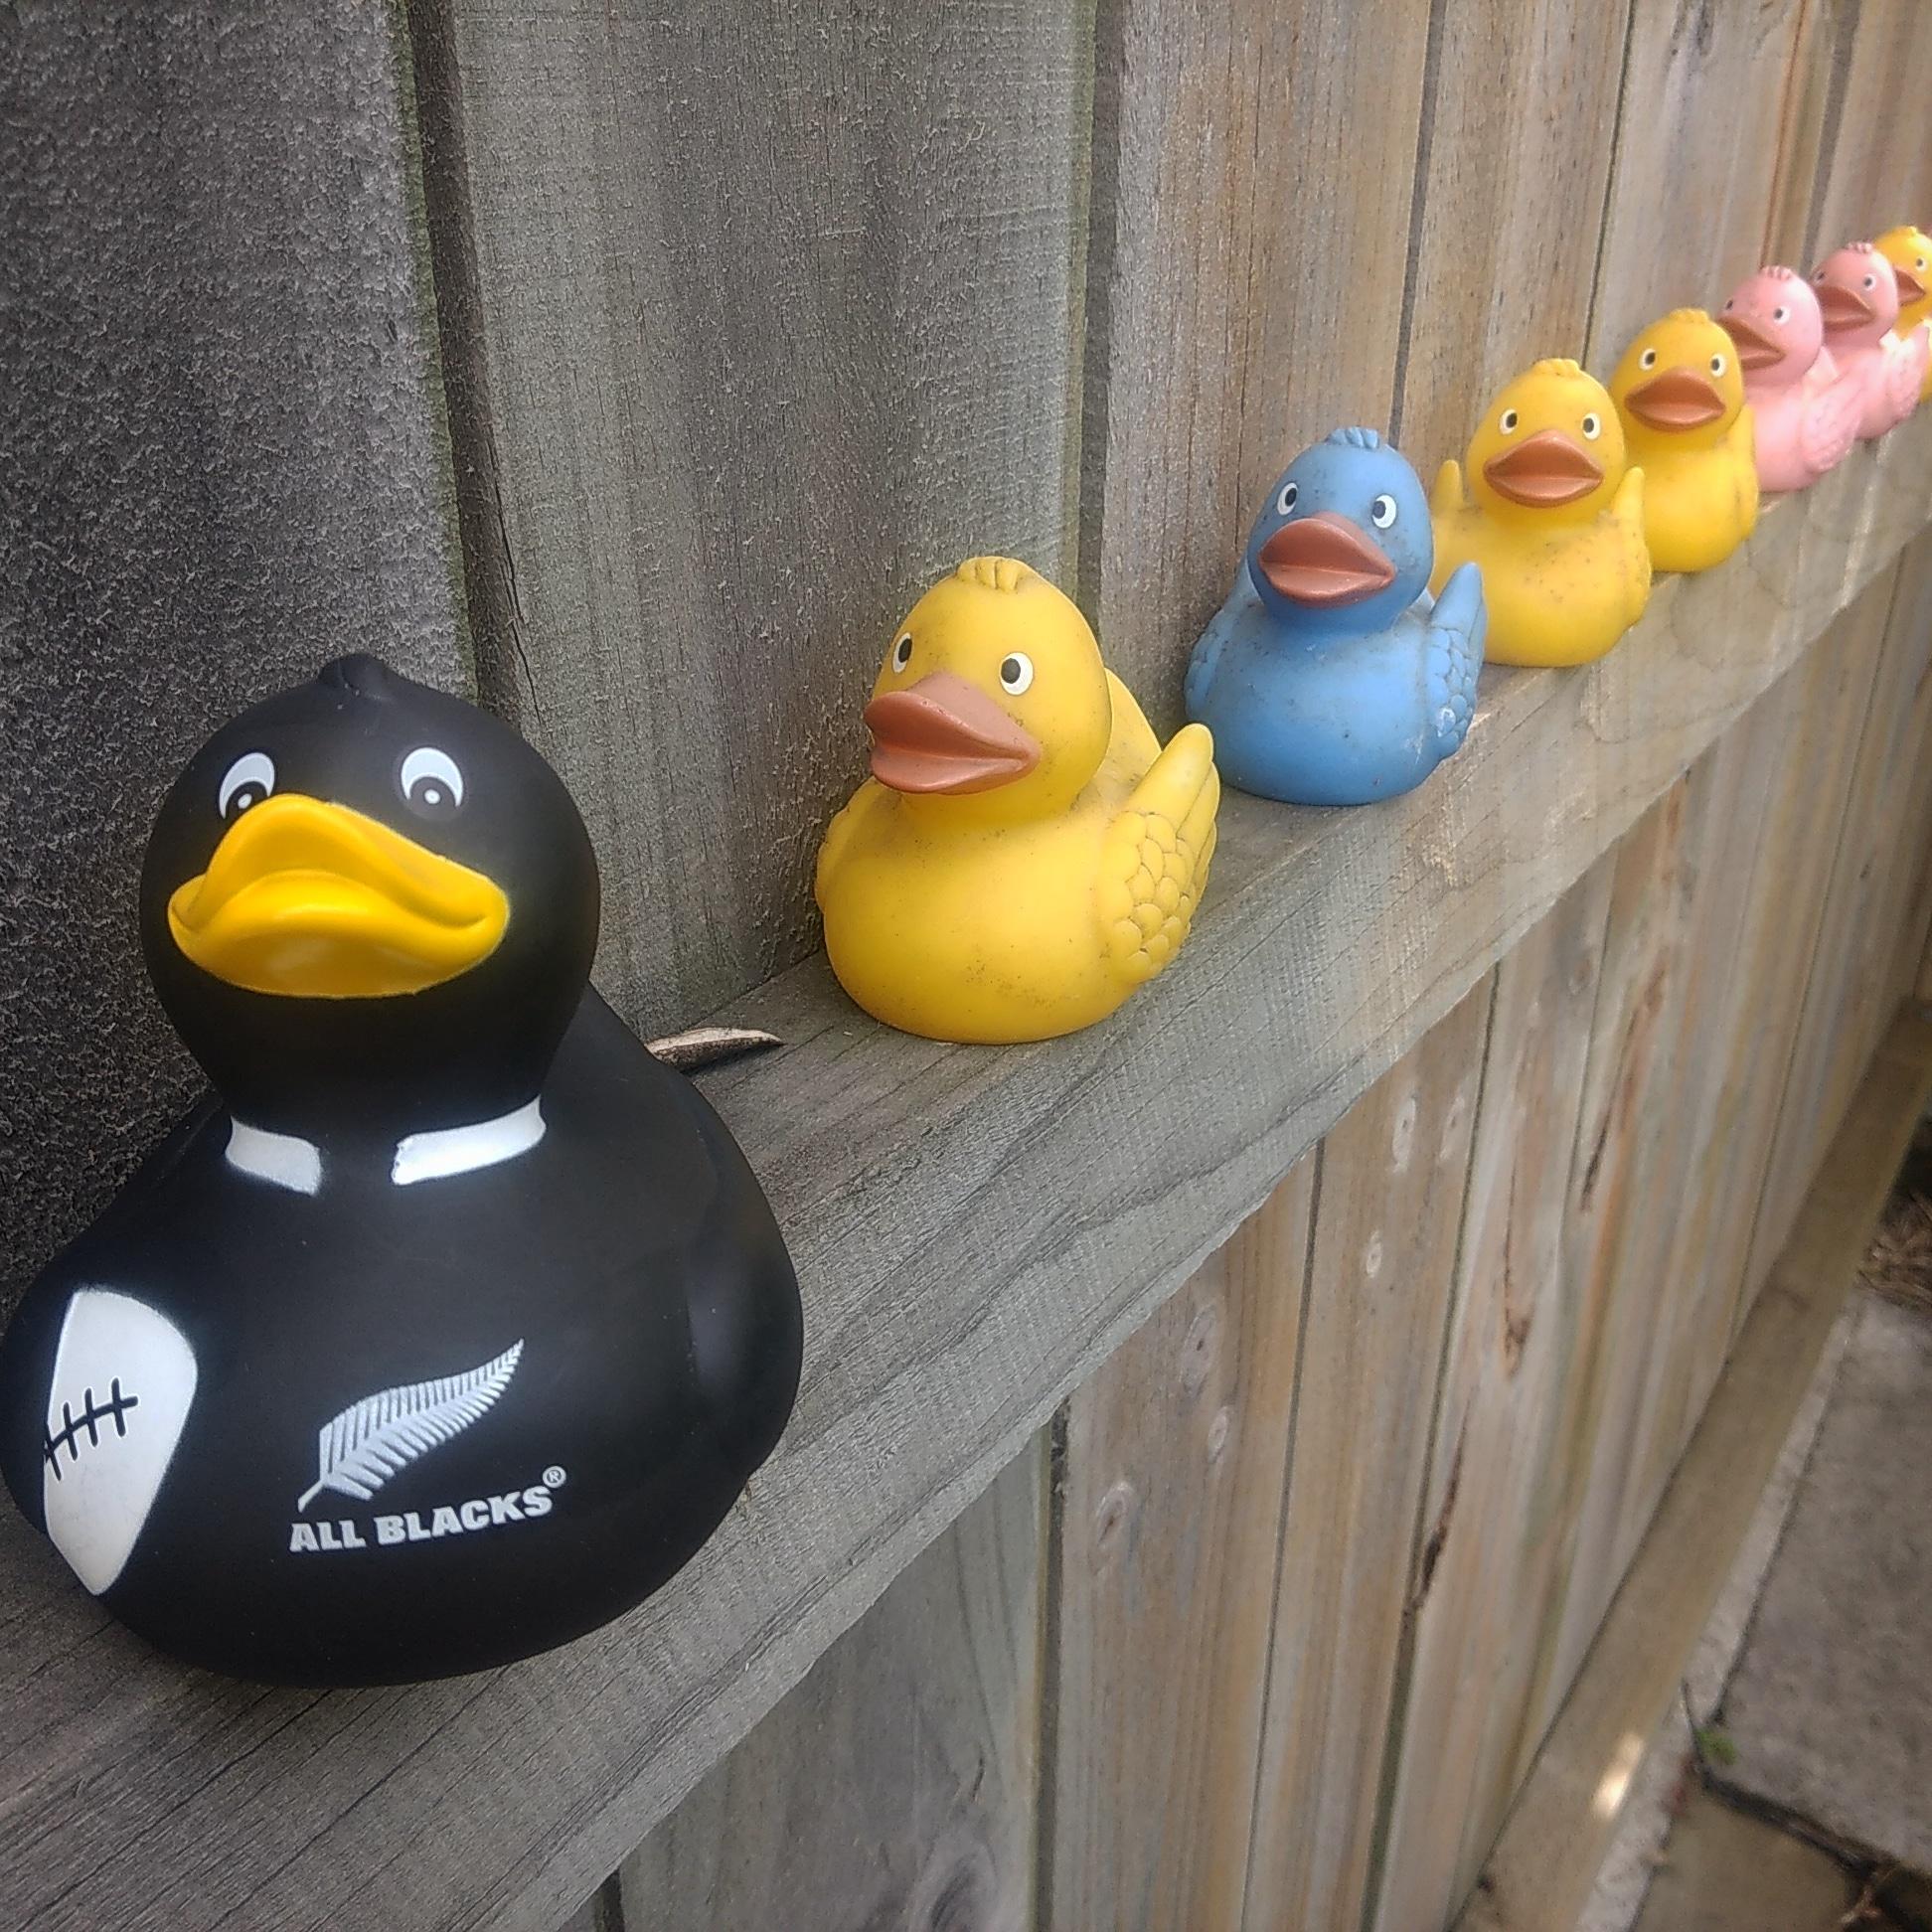 All balcks duck at Designer Garden